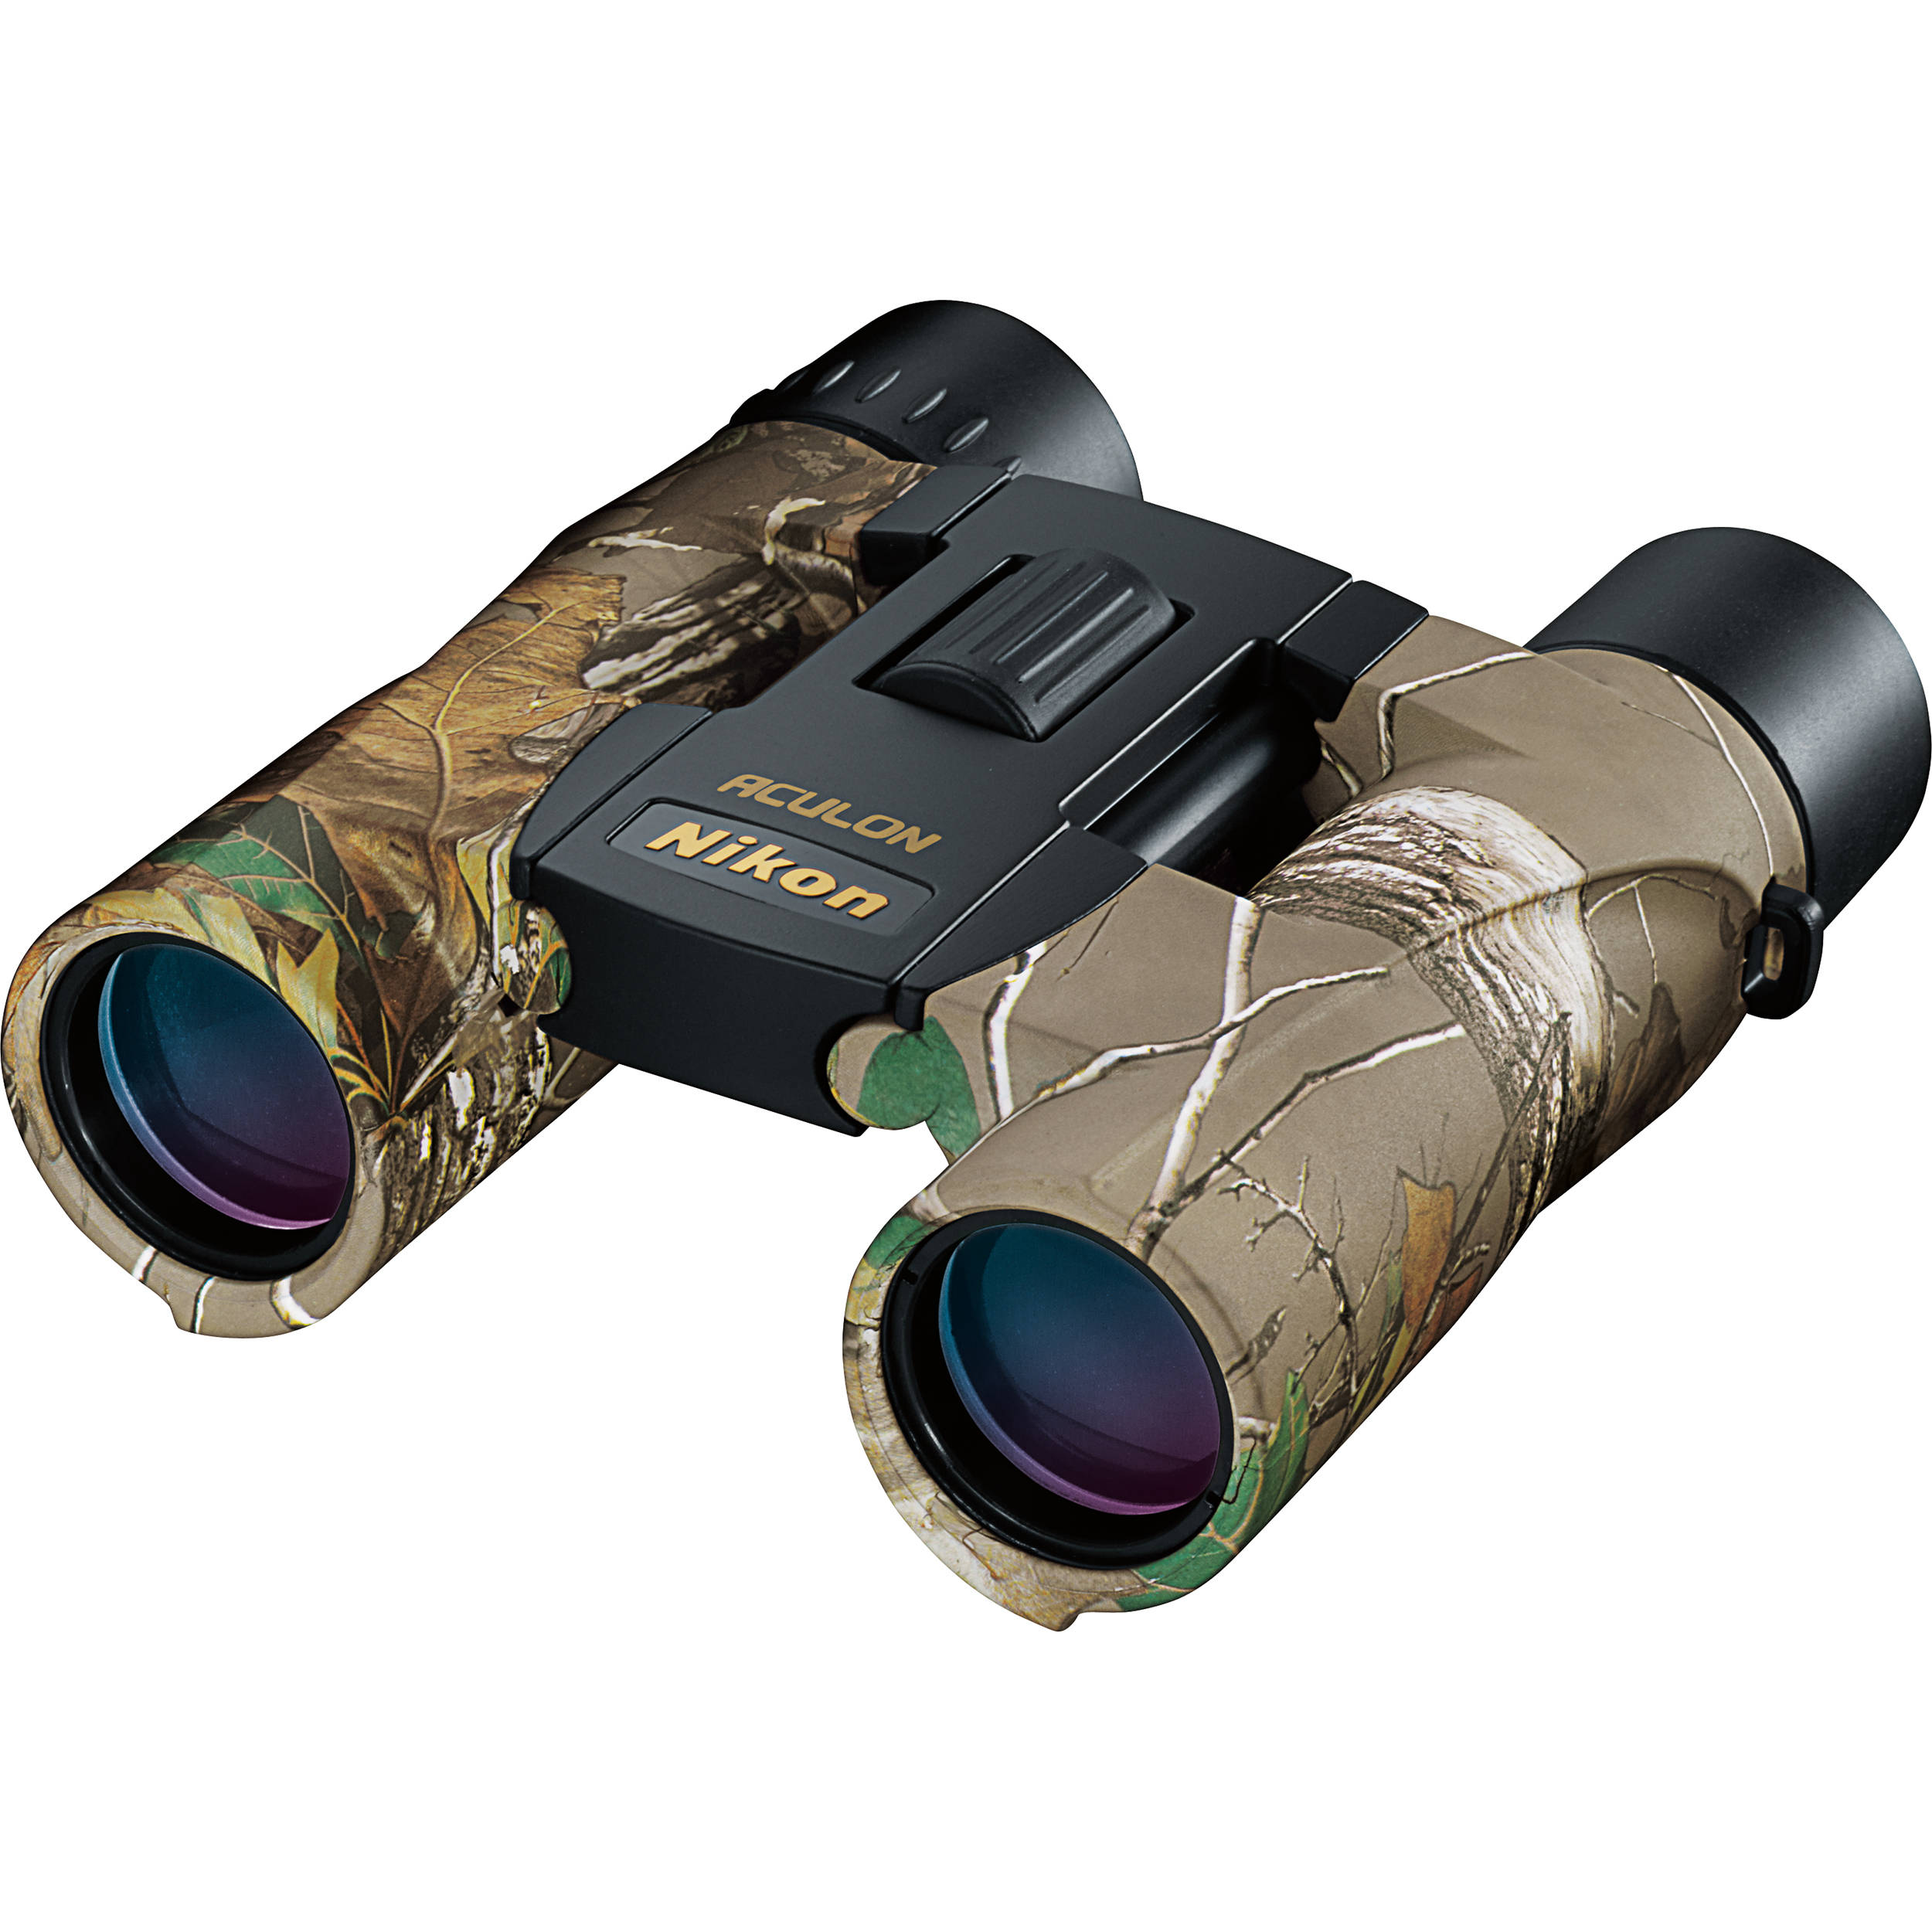 Nikon 10x25 Aculon A30 Binocular Real Tree Camo 8264 B Amp H